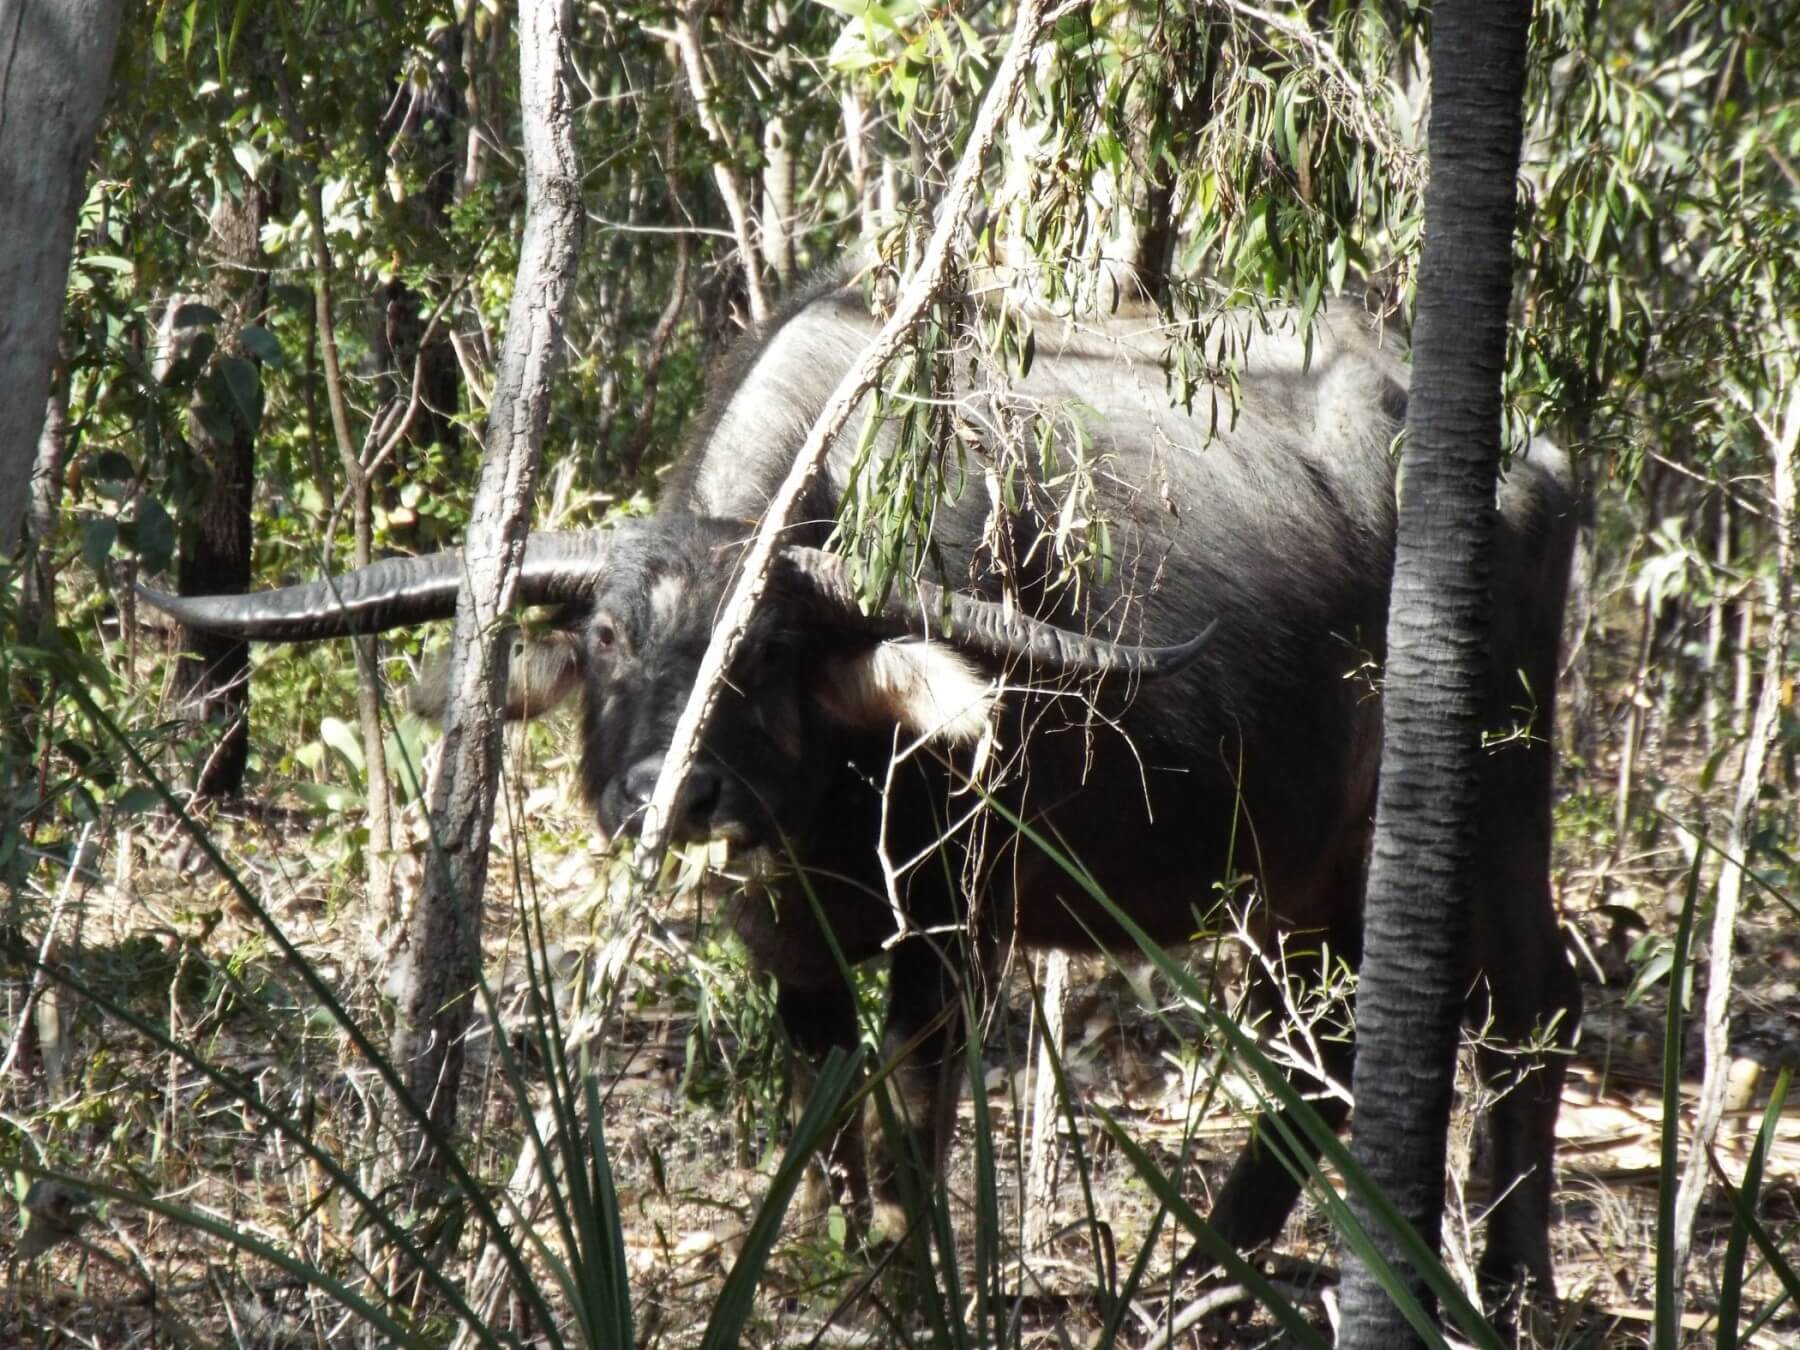 50 Inch Water Buffalo